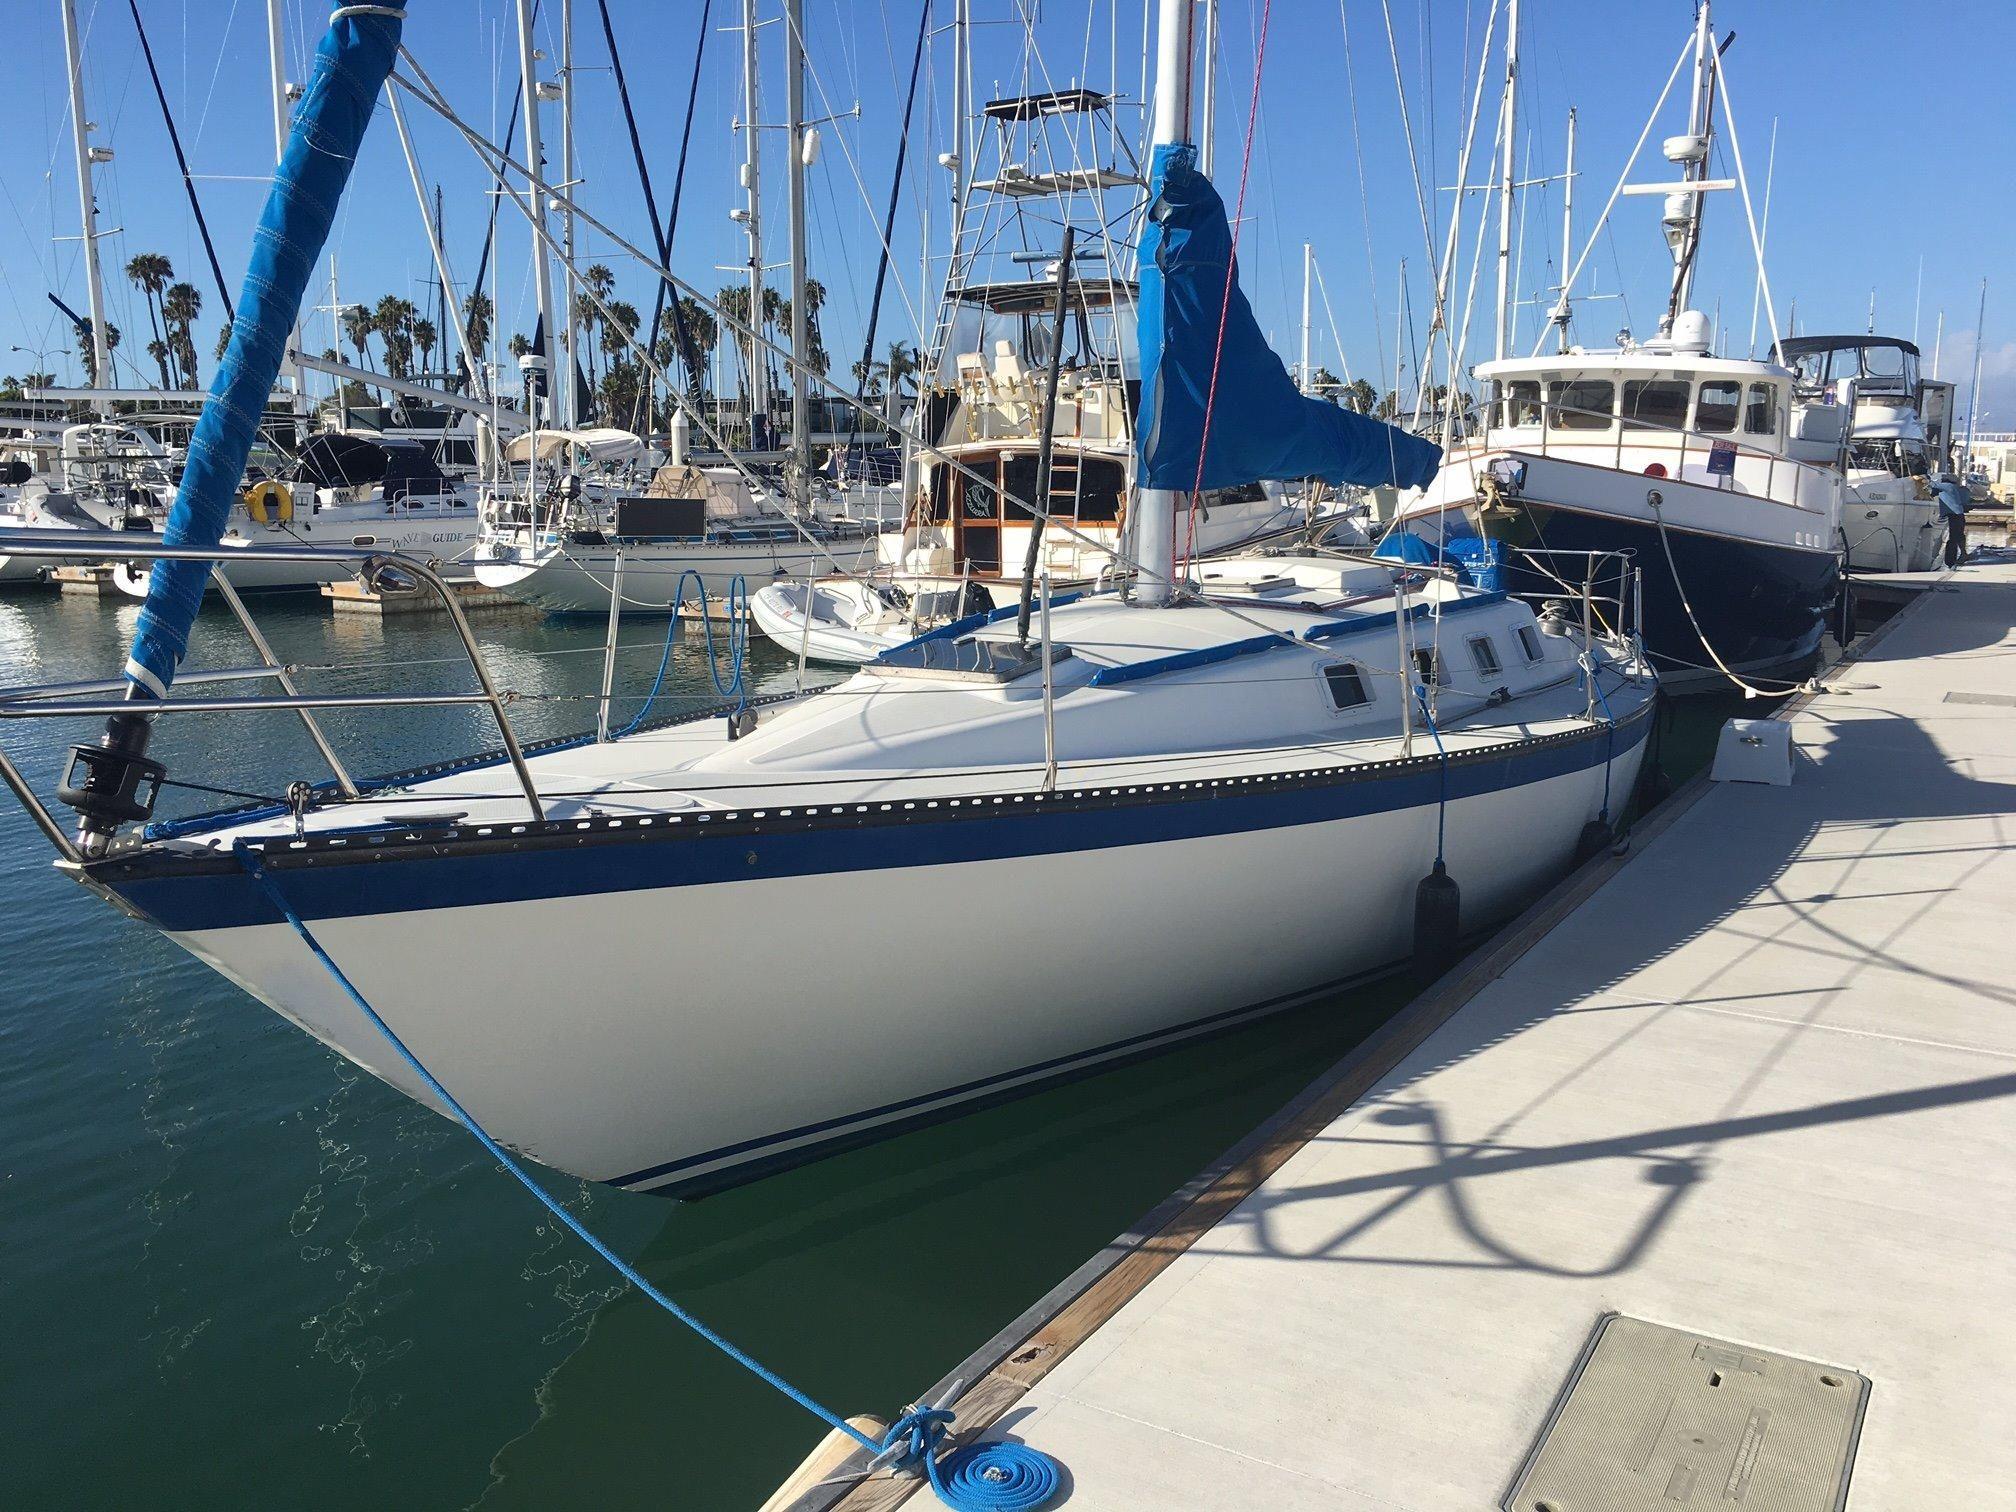 36' lancer 36 1980 | seacoast yachts